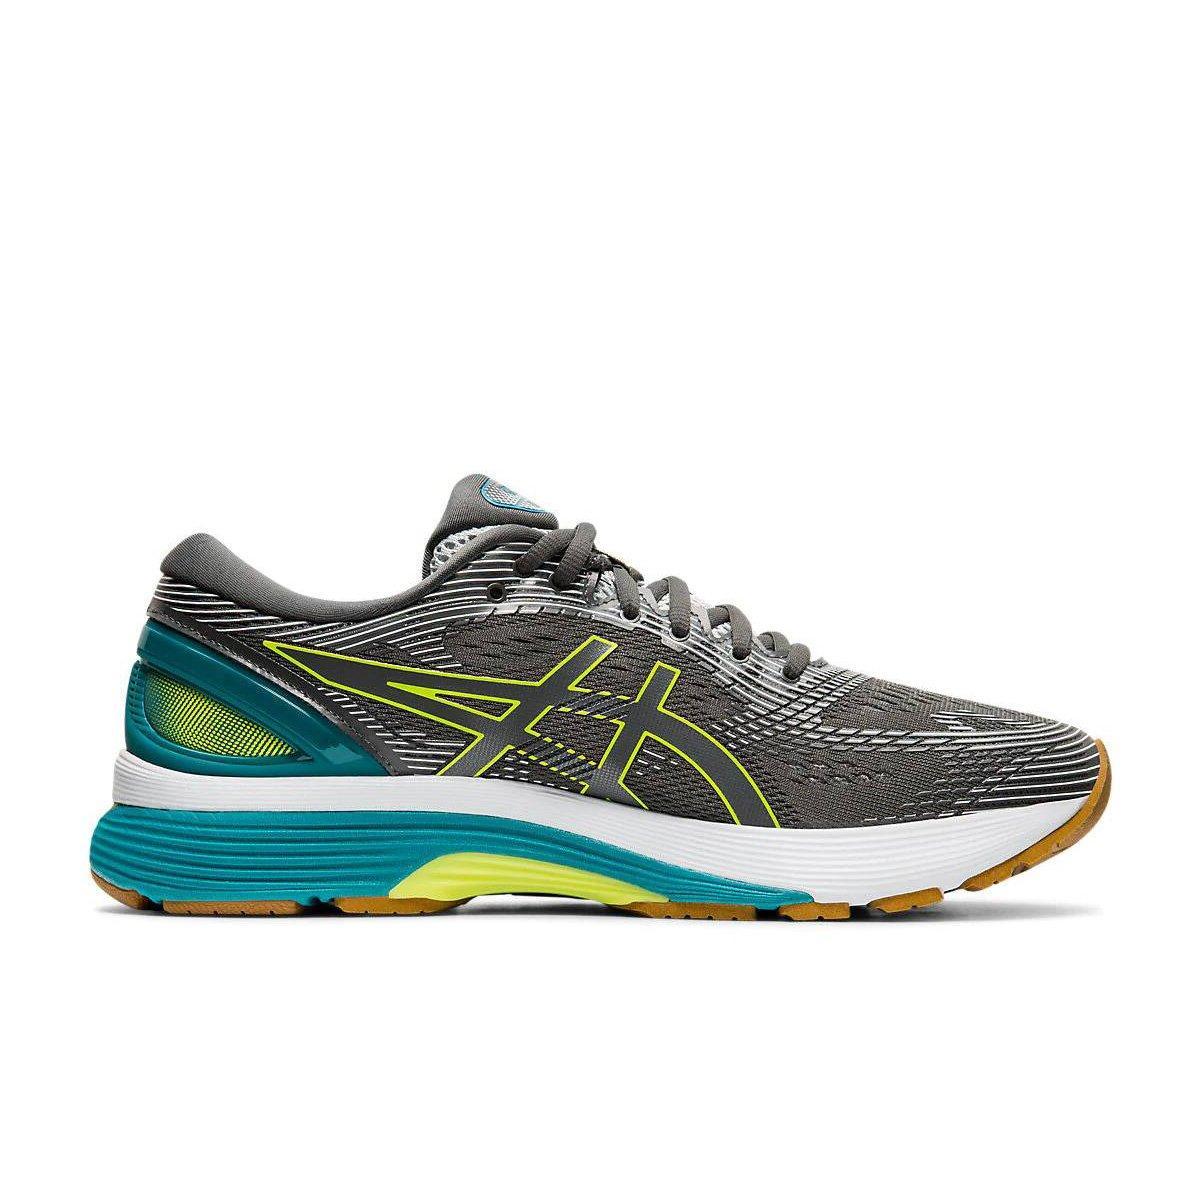 92487a100c2 asics mens running shoes - www.cytal.it